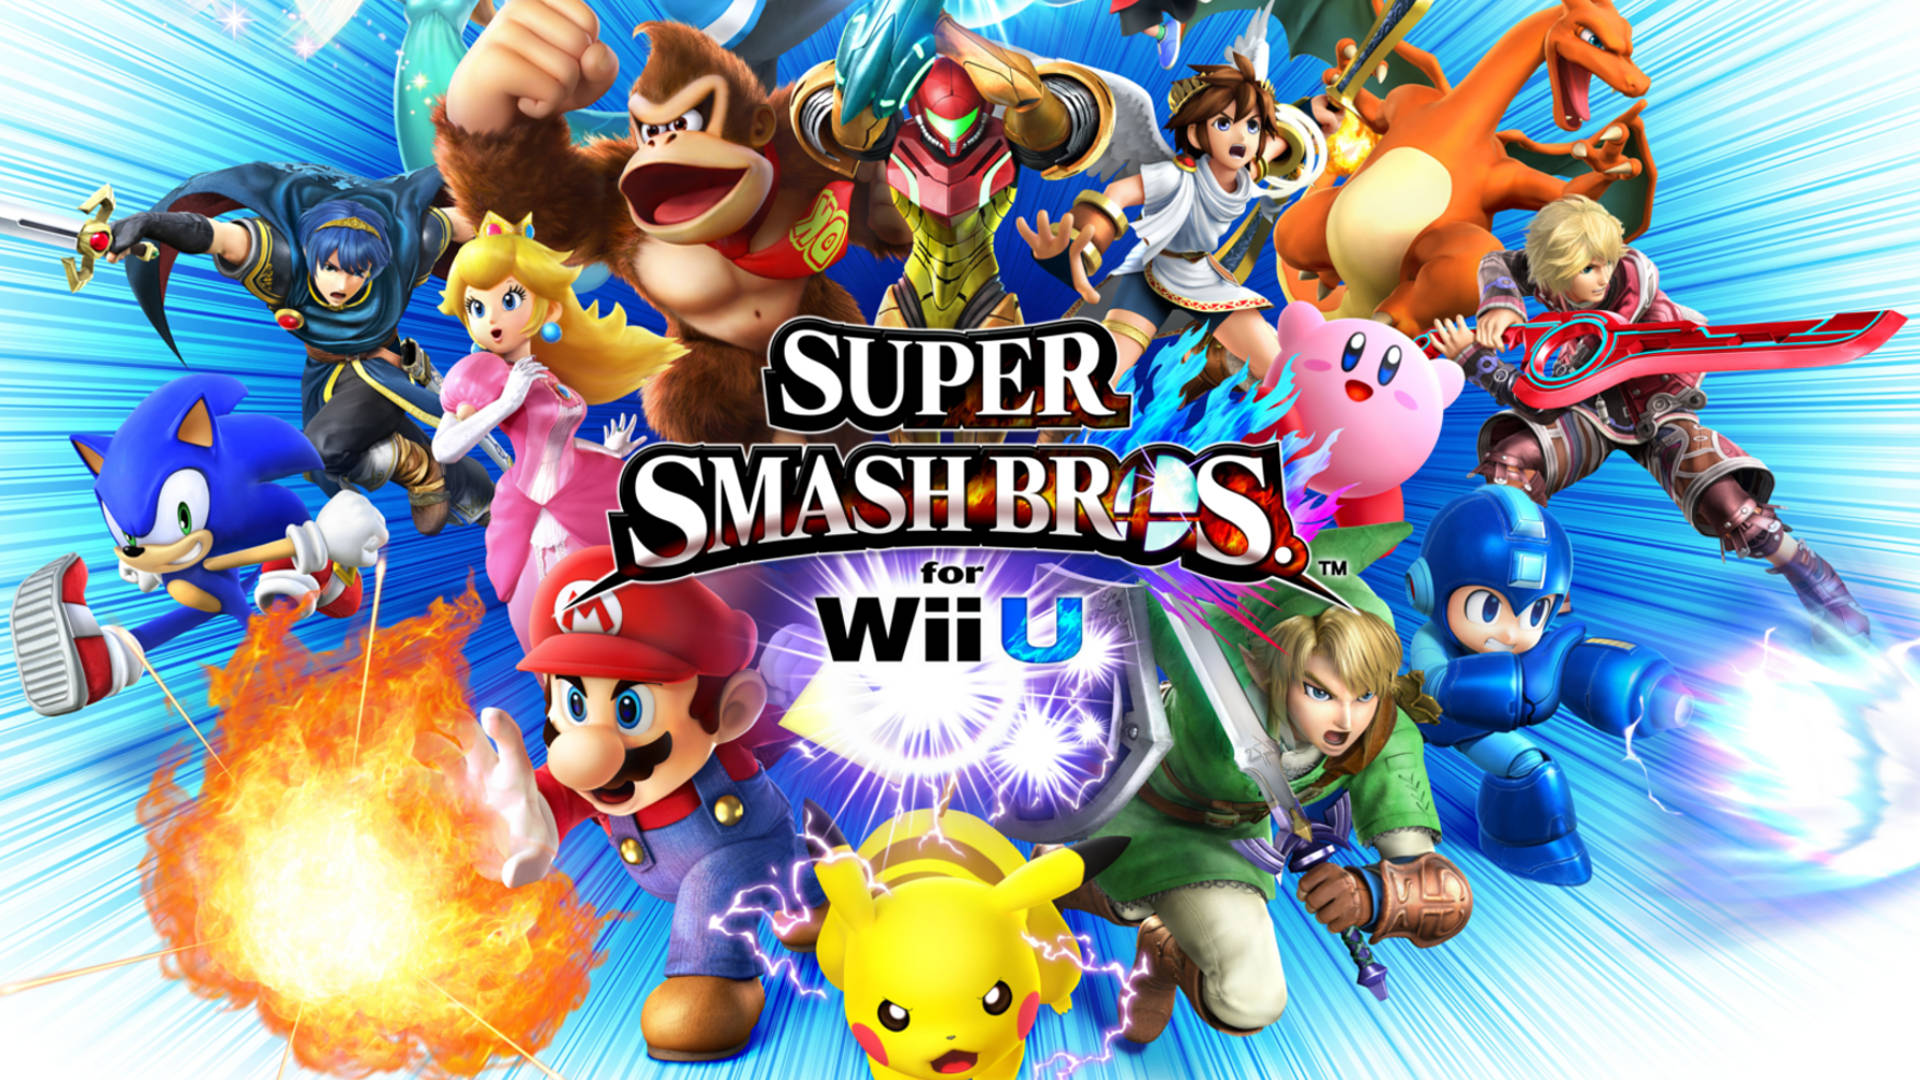 Wii U Super Smash Bros.